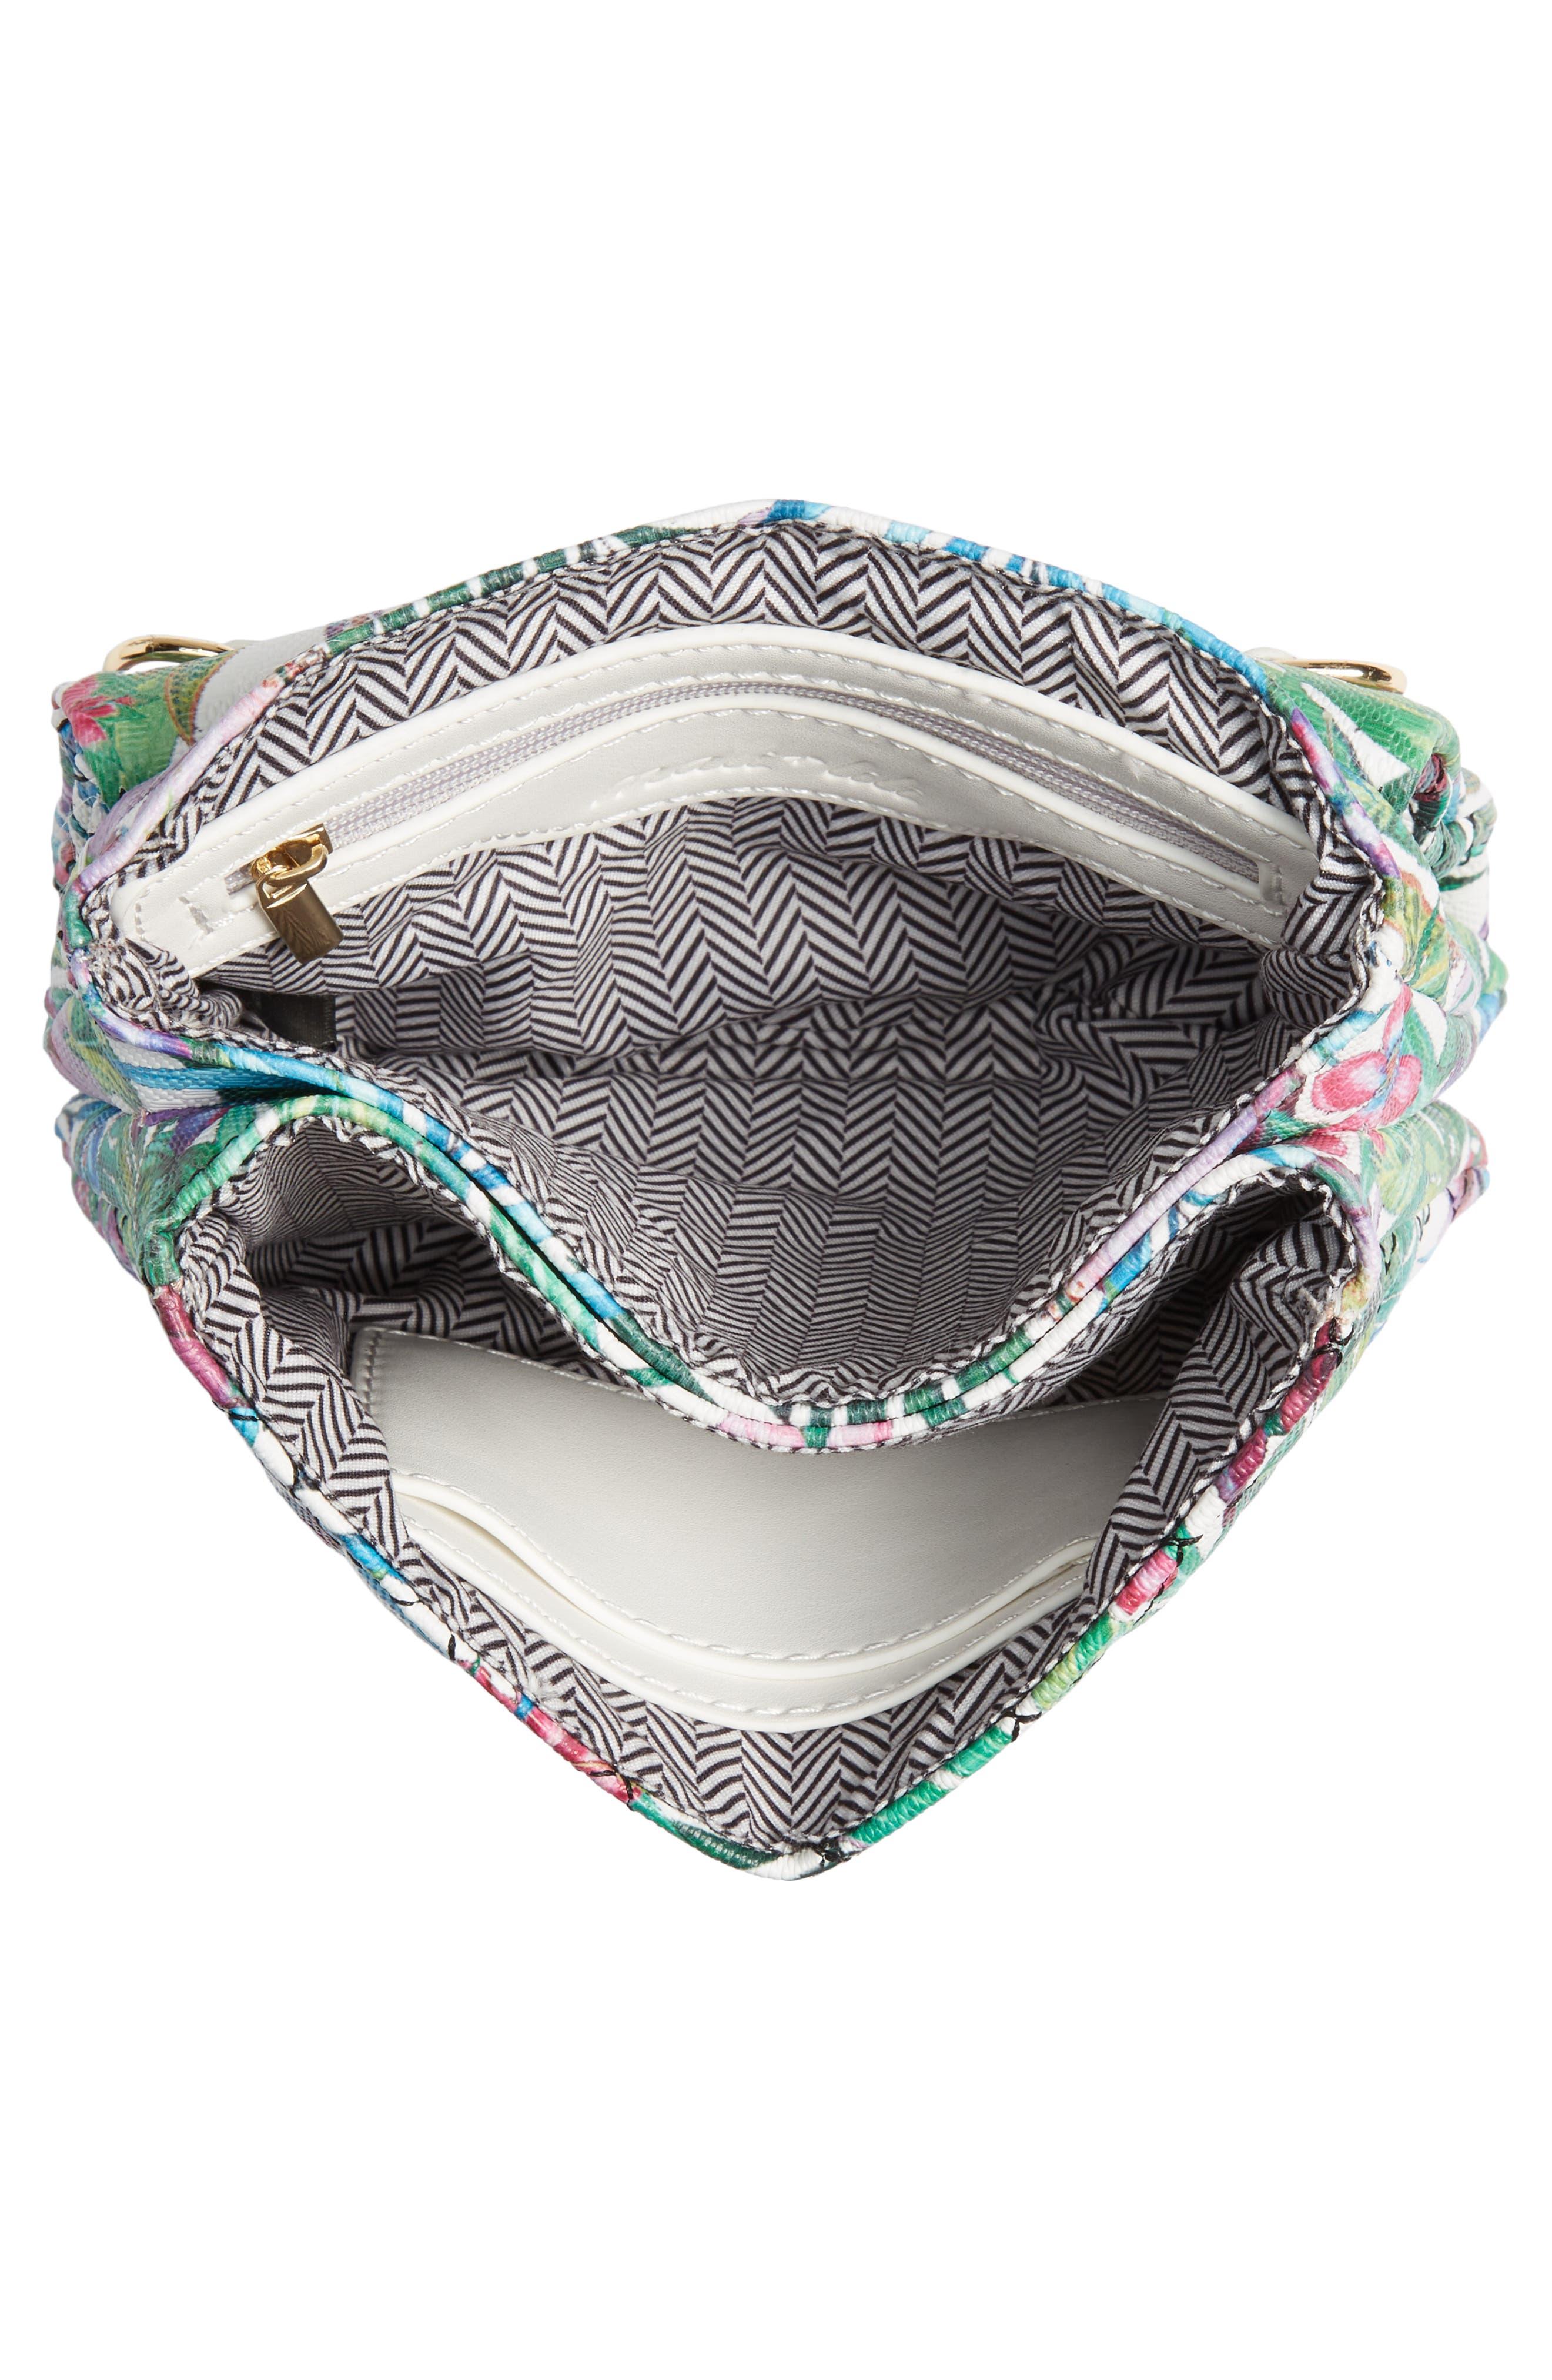 MALI + LILI,                             Quilted Vegan Leather Belt Bag,                             Alternate thumbnail 6, color,                             WHITE FLORAL